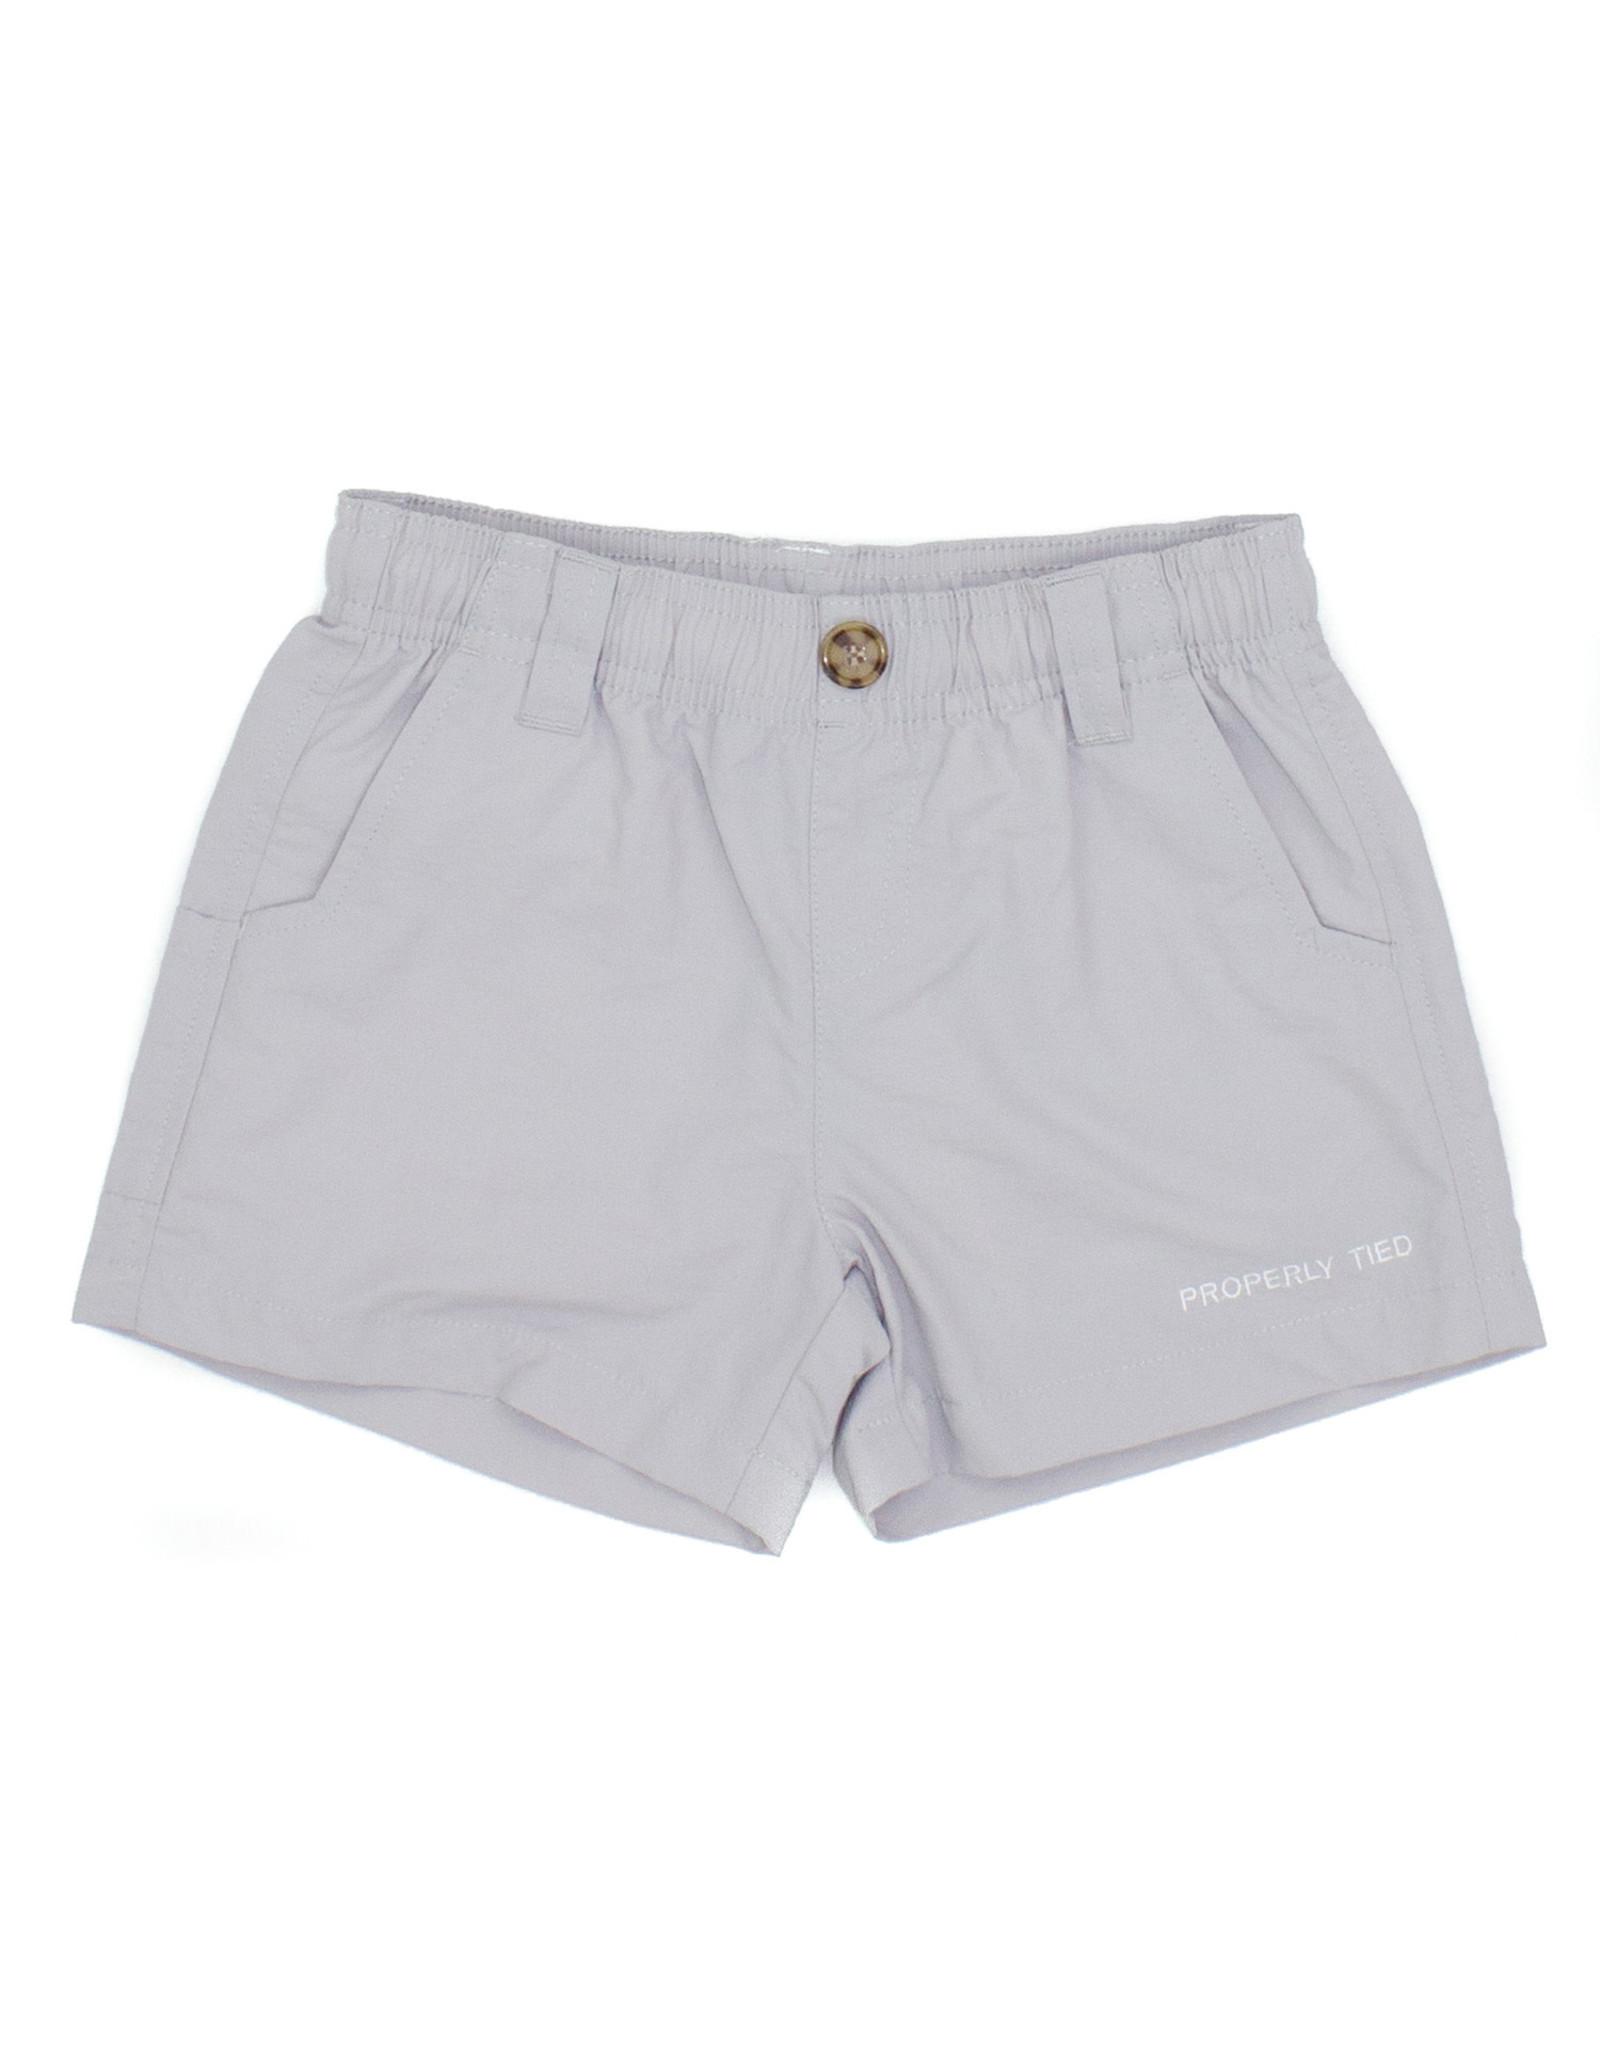 Properly Tied Mallard Shorts, Light Gray